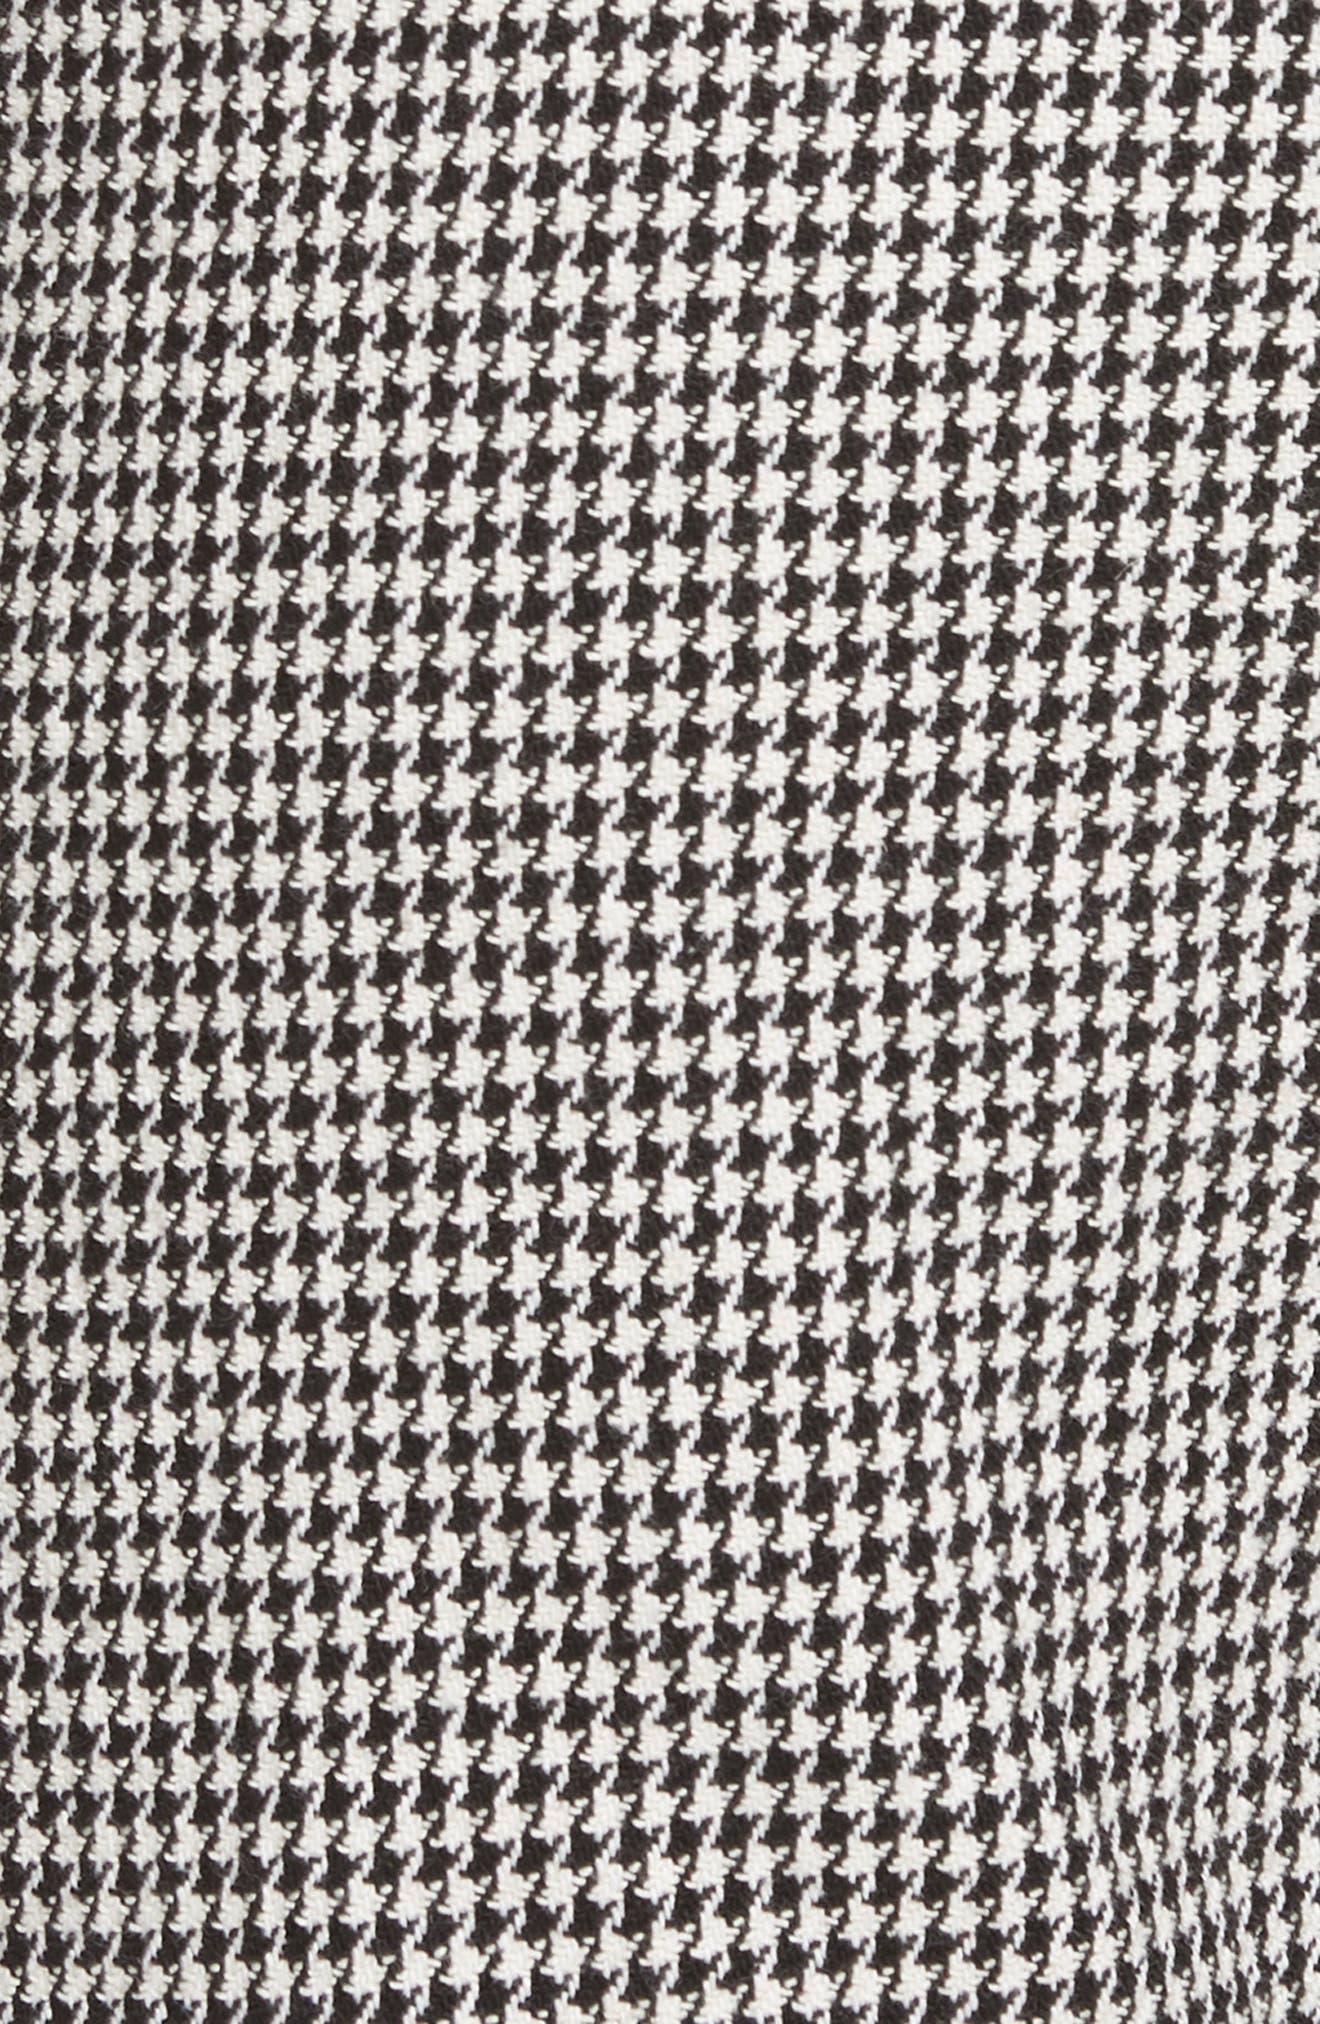 Felton Houndstooth Trousers,                             Alternate thumbnail 5, color,                             BLACK/WHITE